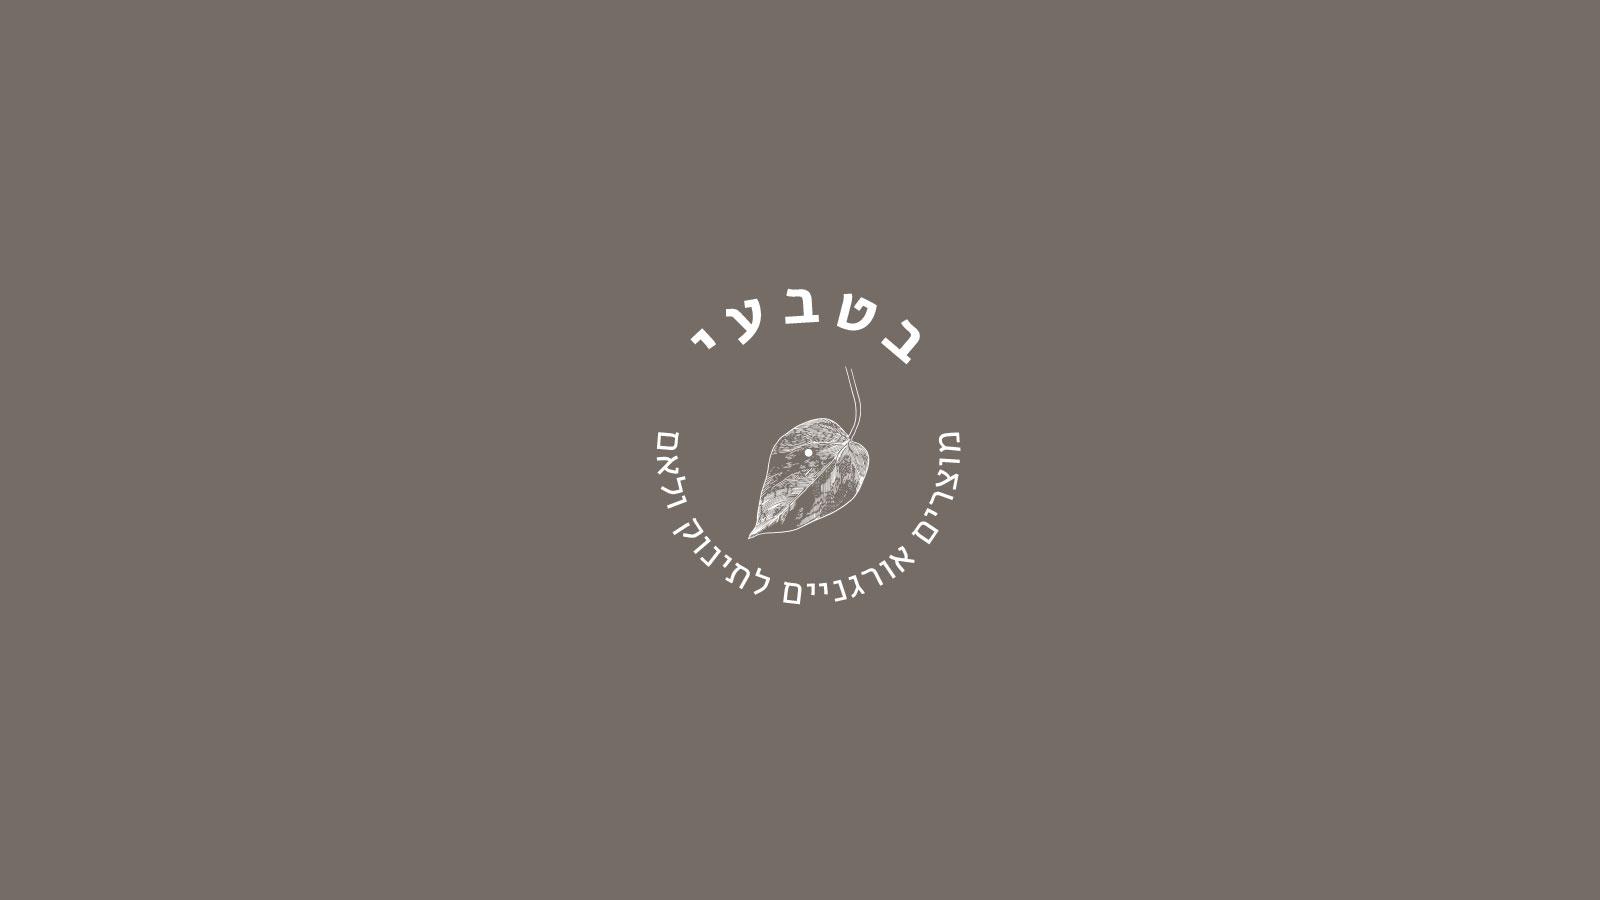 Logo design organic products עיצוב לוגו חברת מארזי מתנות אורגניות בטבעי